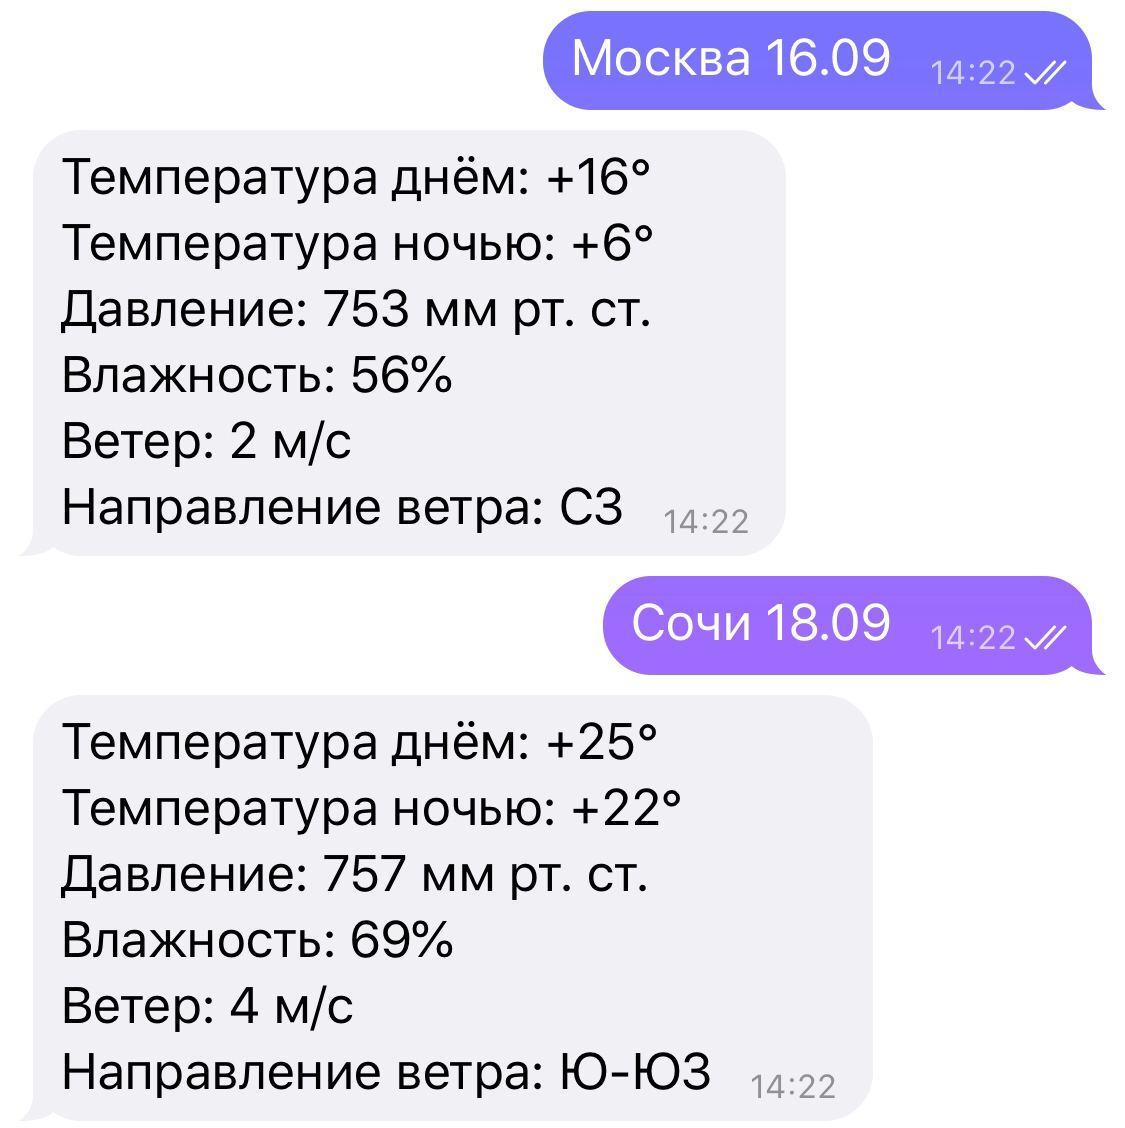 E409811123